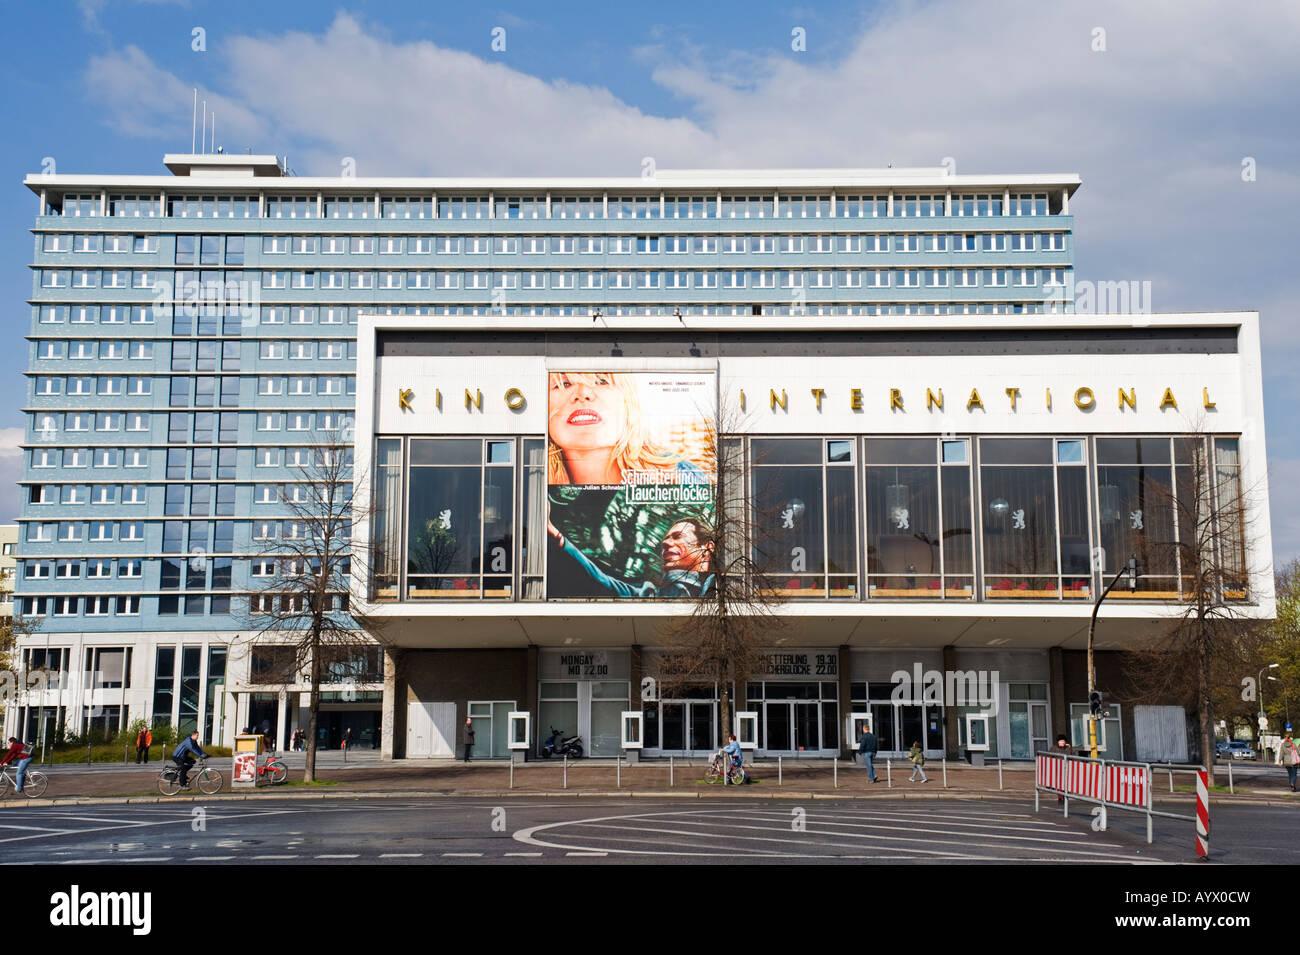 Famous former East German Kino International cinema on Karl Marx Allee in Berlin Germany 2008 - Stock Image